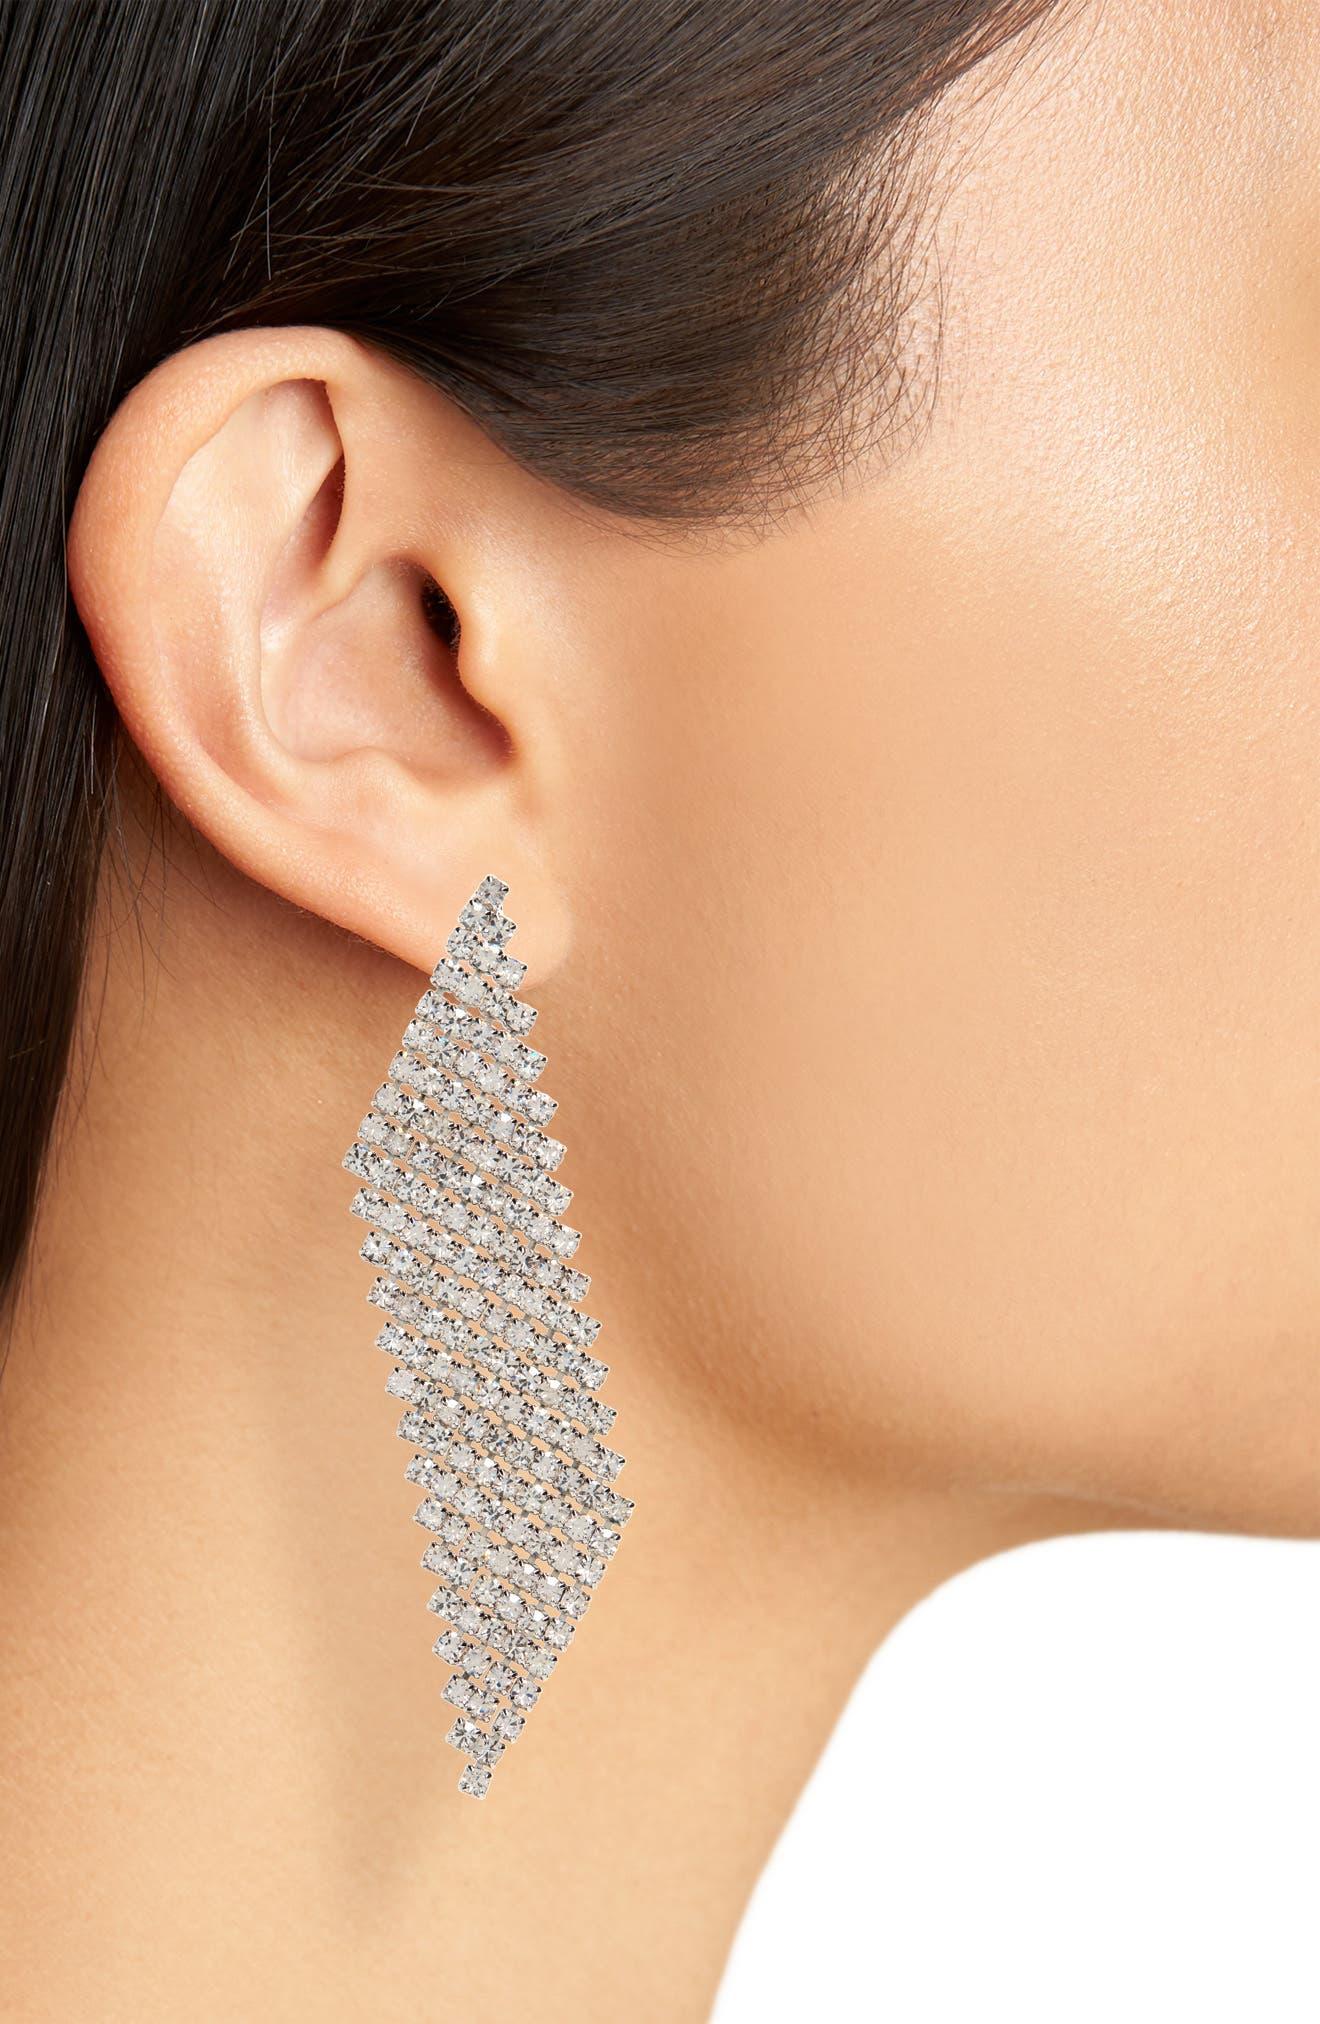 Crystal Slice Earrings,                             Alternate thumbnail 2, color,                             SILVER/ CRYSTAL